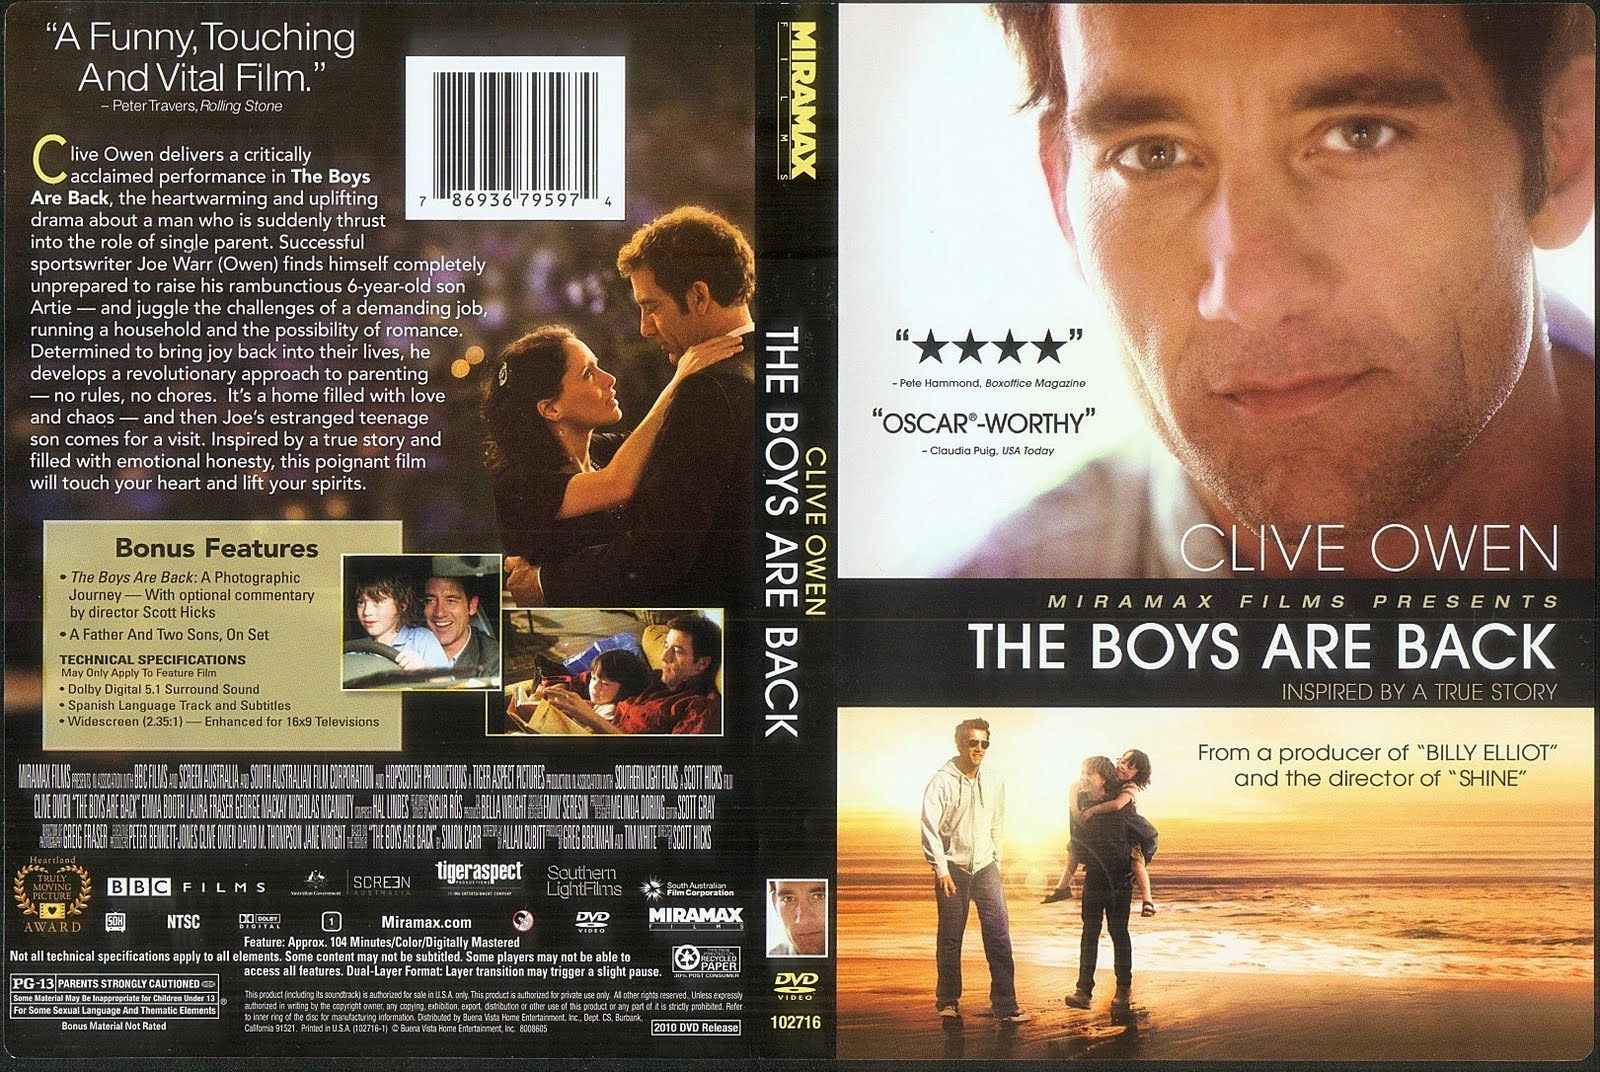 http://3.bp.blogspot.com/_LNSrzQb3KZg/S_vCm0qSoHI/AAAAAAAAHfY/vcswO7dj_cw/s1600/The_Boys_Are_Back_Widescreen_R1-%255Bcdcovers_cc%255D-front.jpg